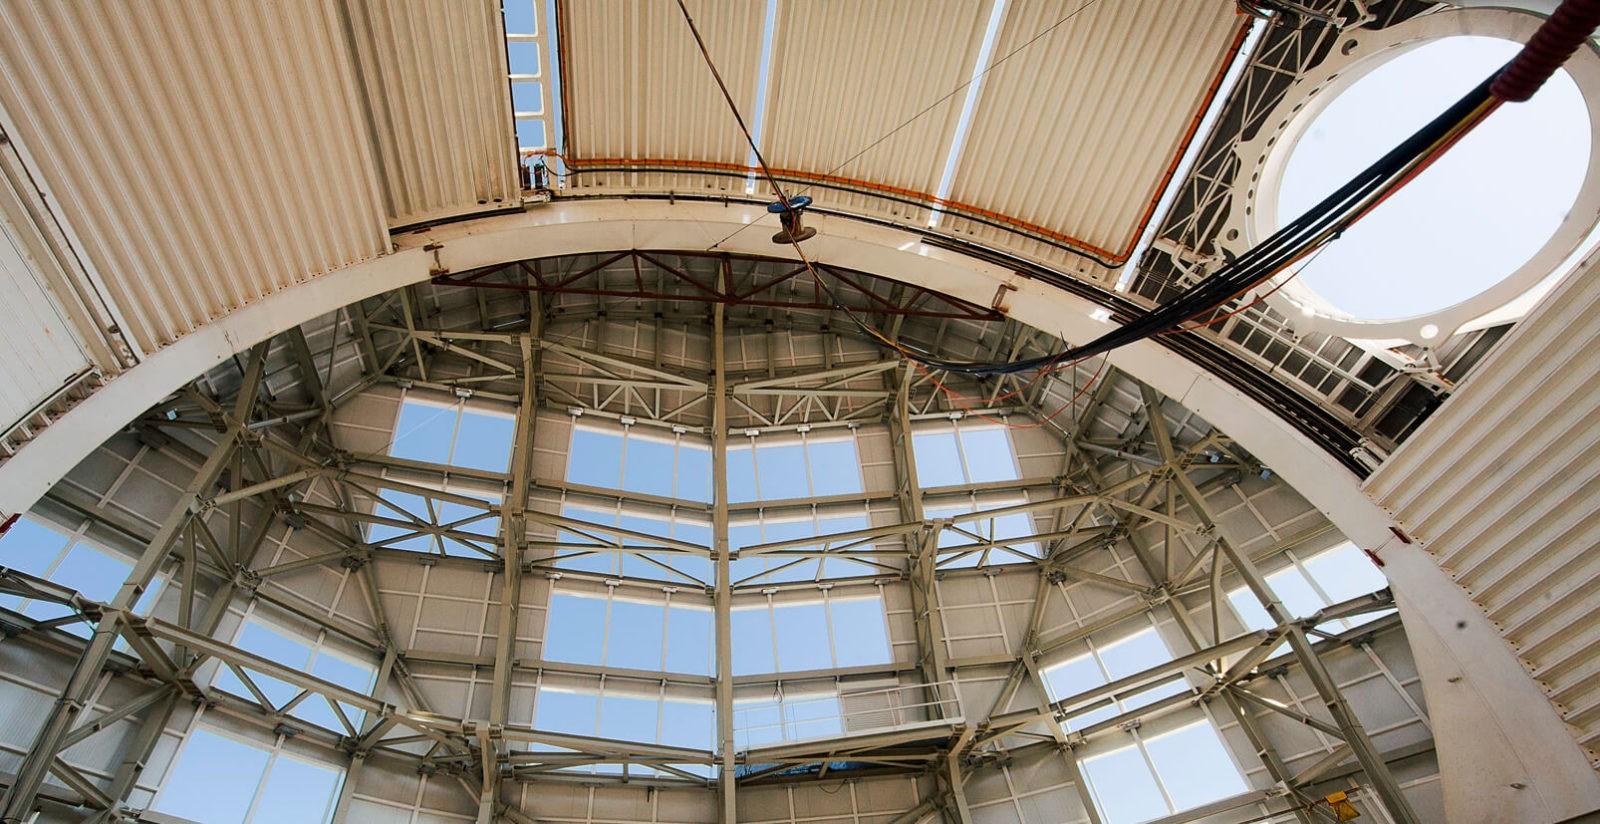 Telescope_Enclosures_Singular_Projects_USA_Chile_Spain_IDOM_ADA_2_